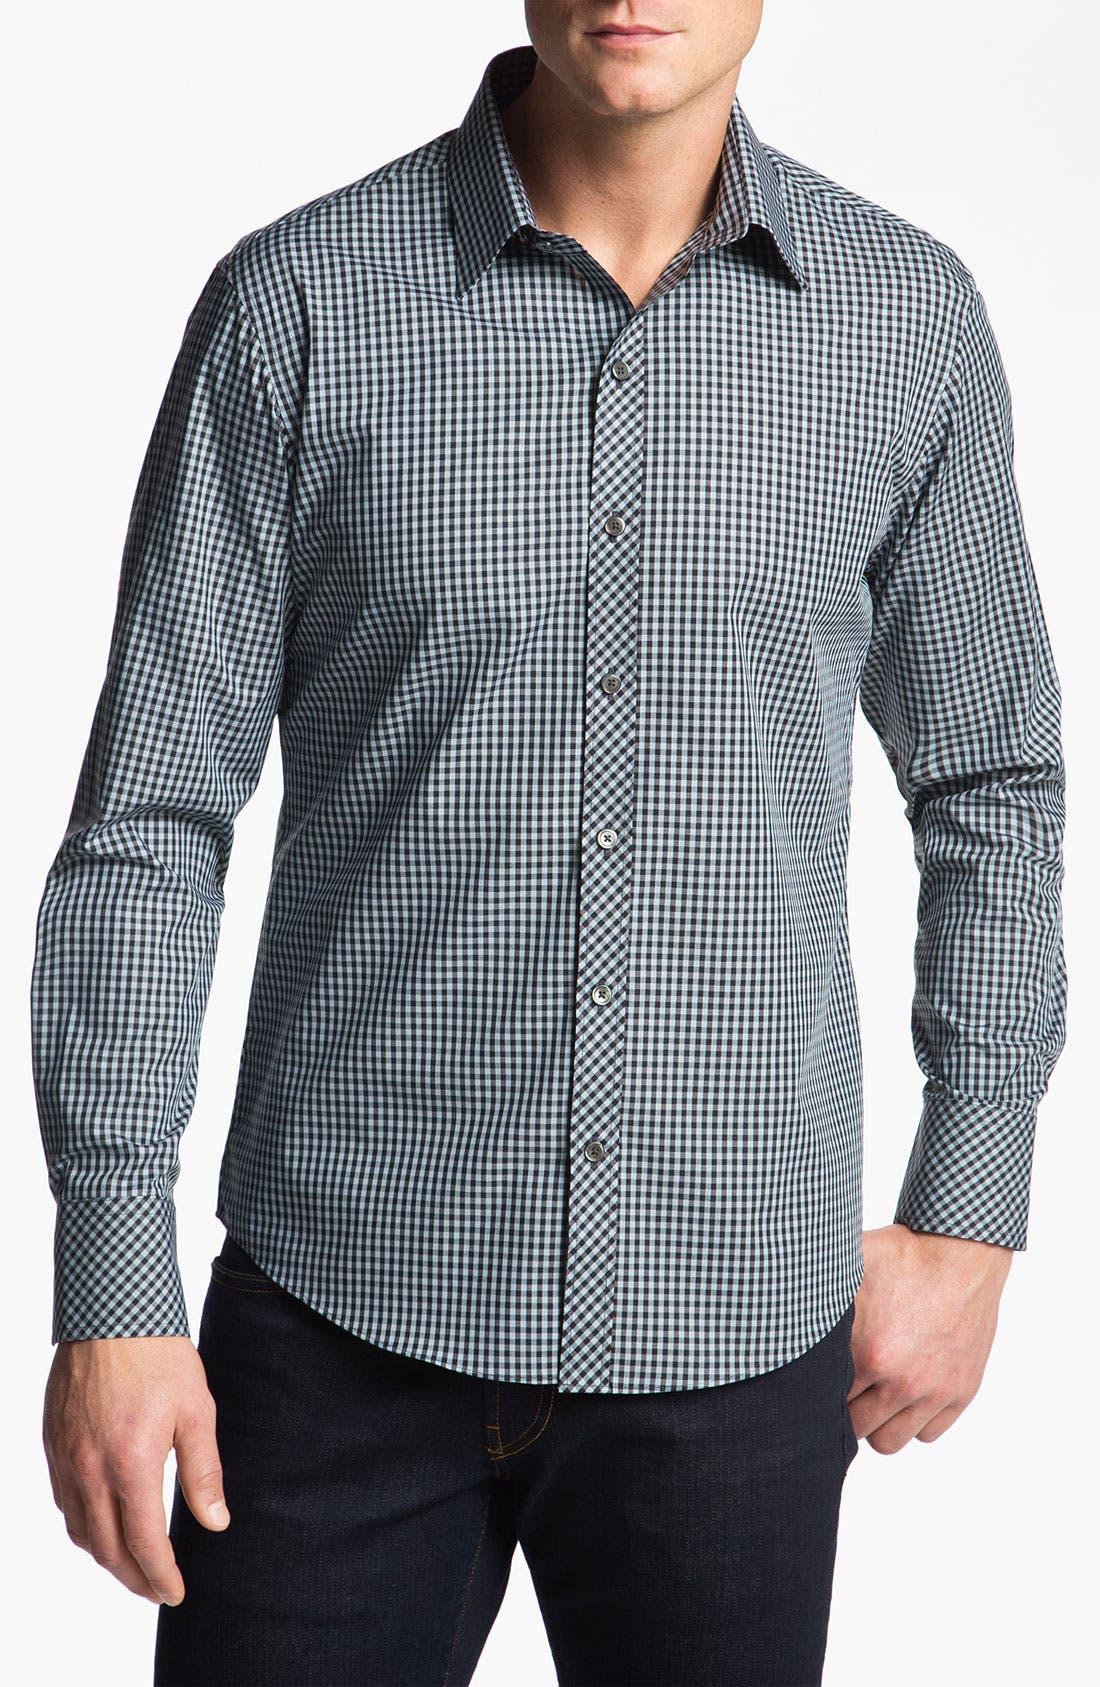 Alternate Image 1 Selected - Zachary Prell 'Mayo' Sport Shirt